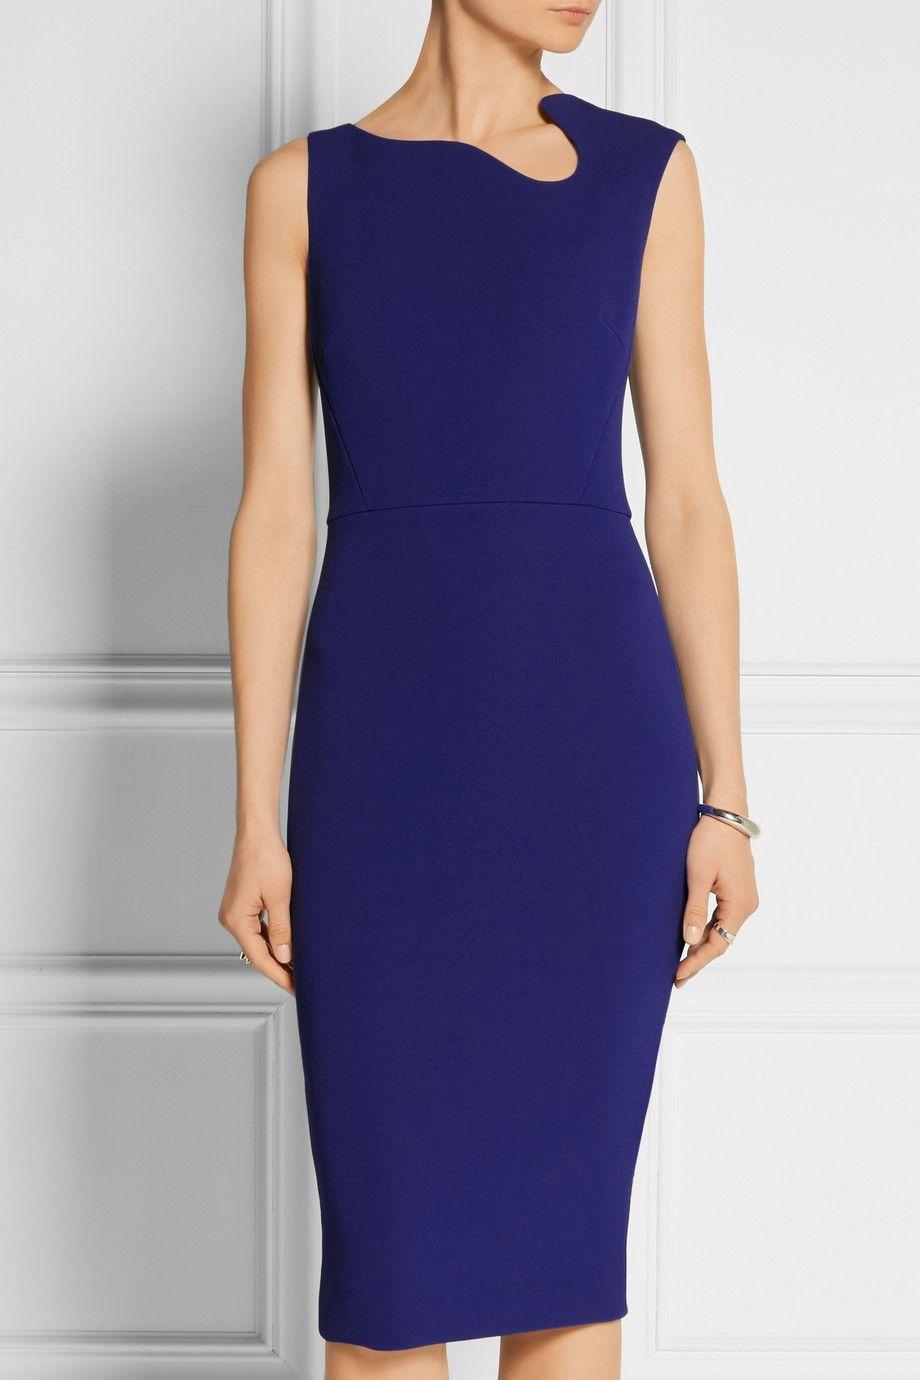 Victoria Beckham Crepe Dress Dresses Crepe Dress Office Dresses For Women [ 1380 x 920 Pixel ]